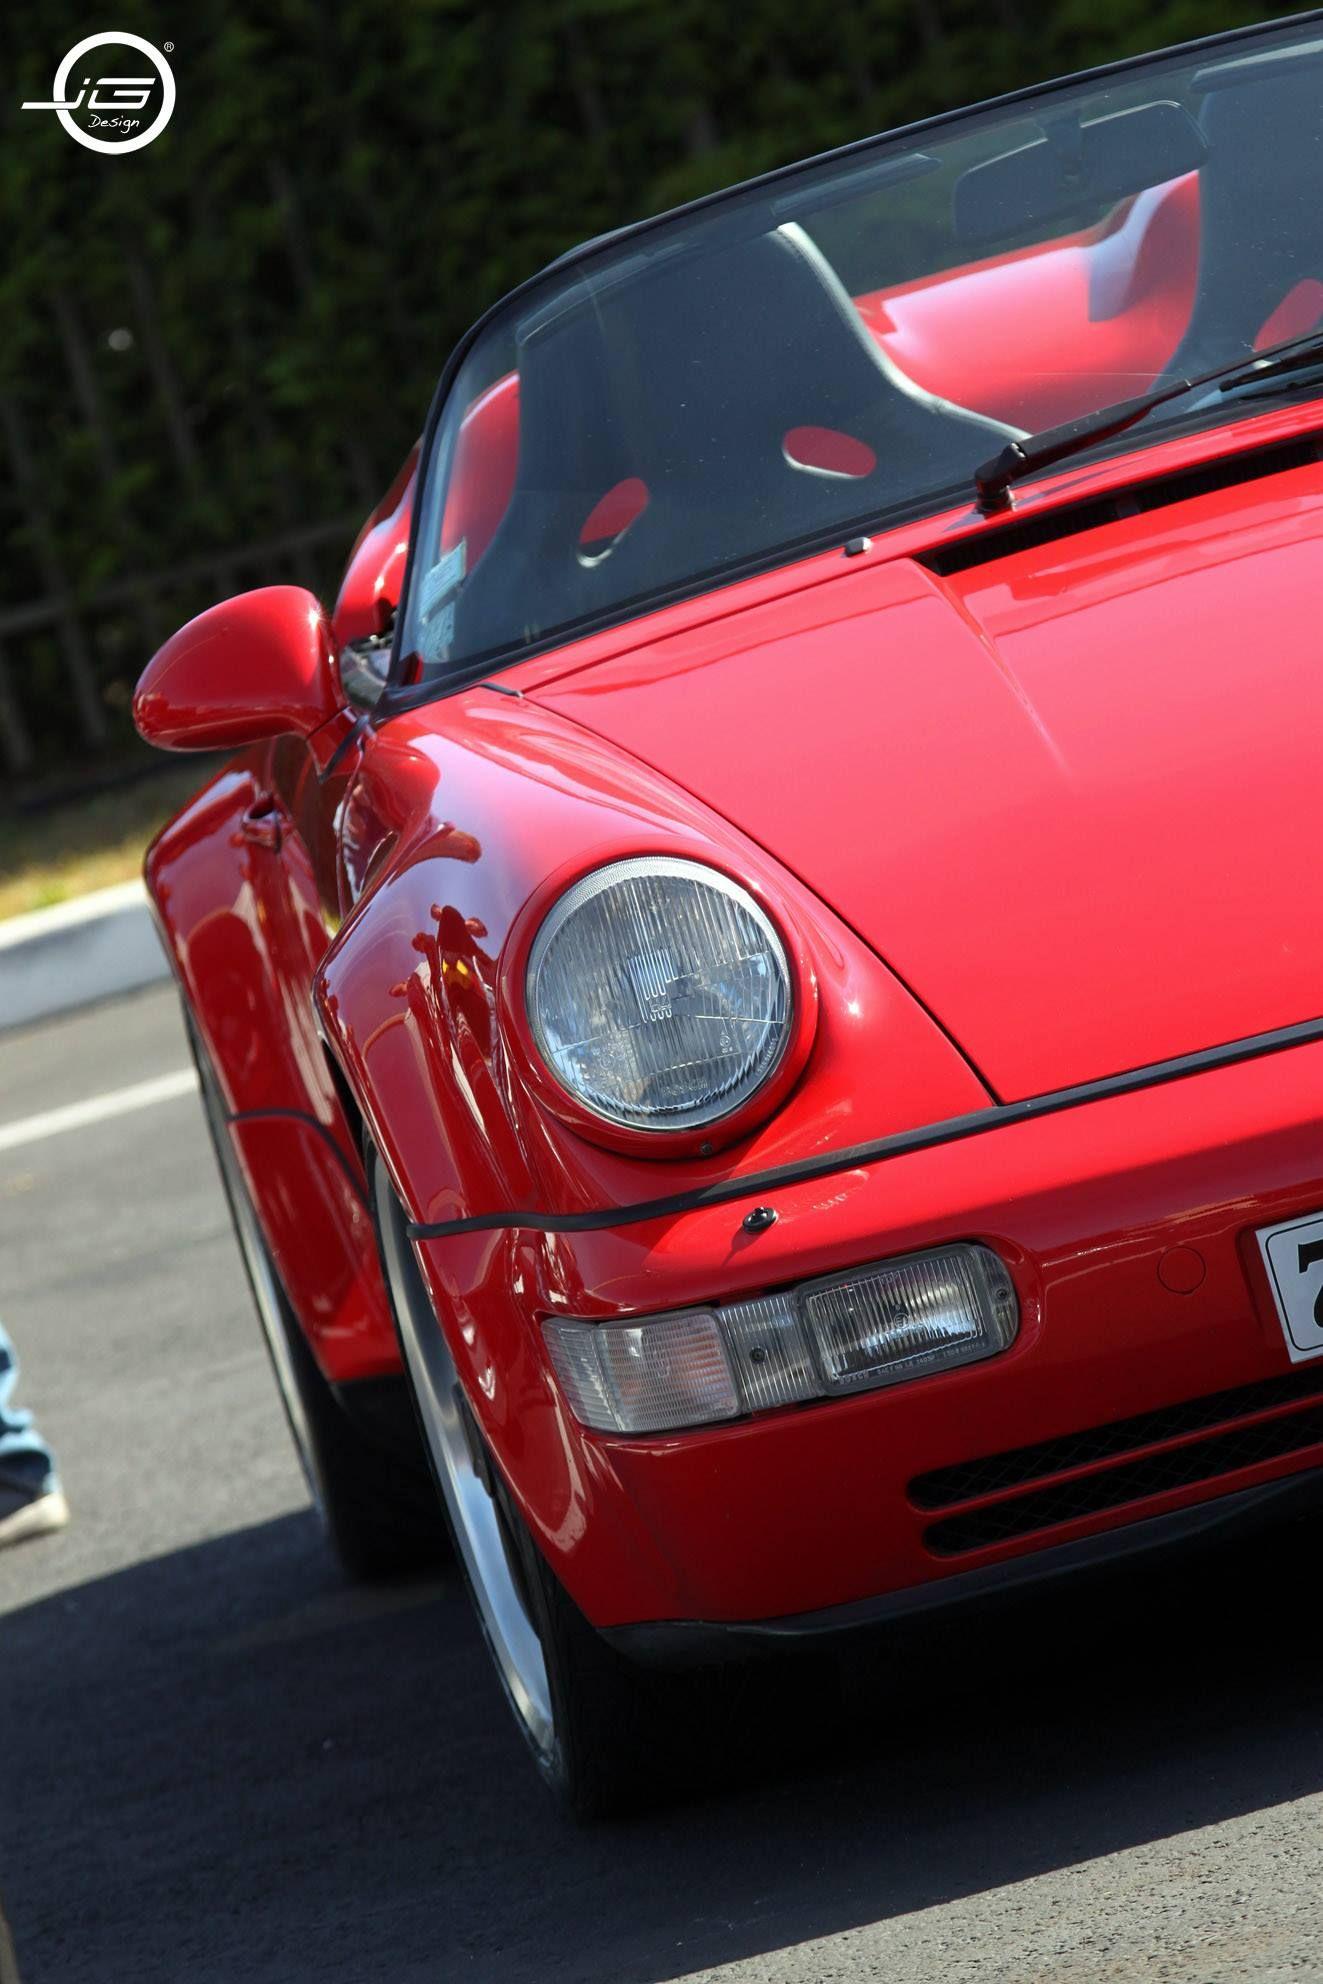 964 Speedster. Porsche 964, Porsche 911 targa, Porsche